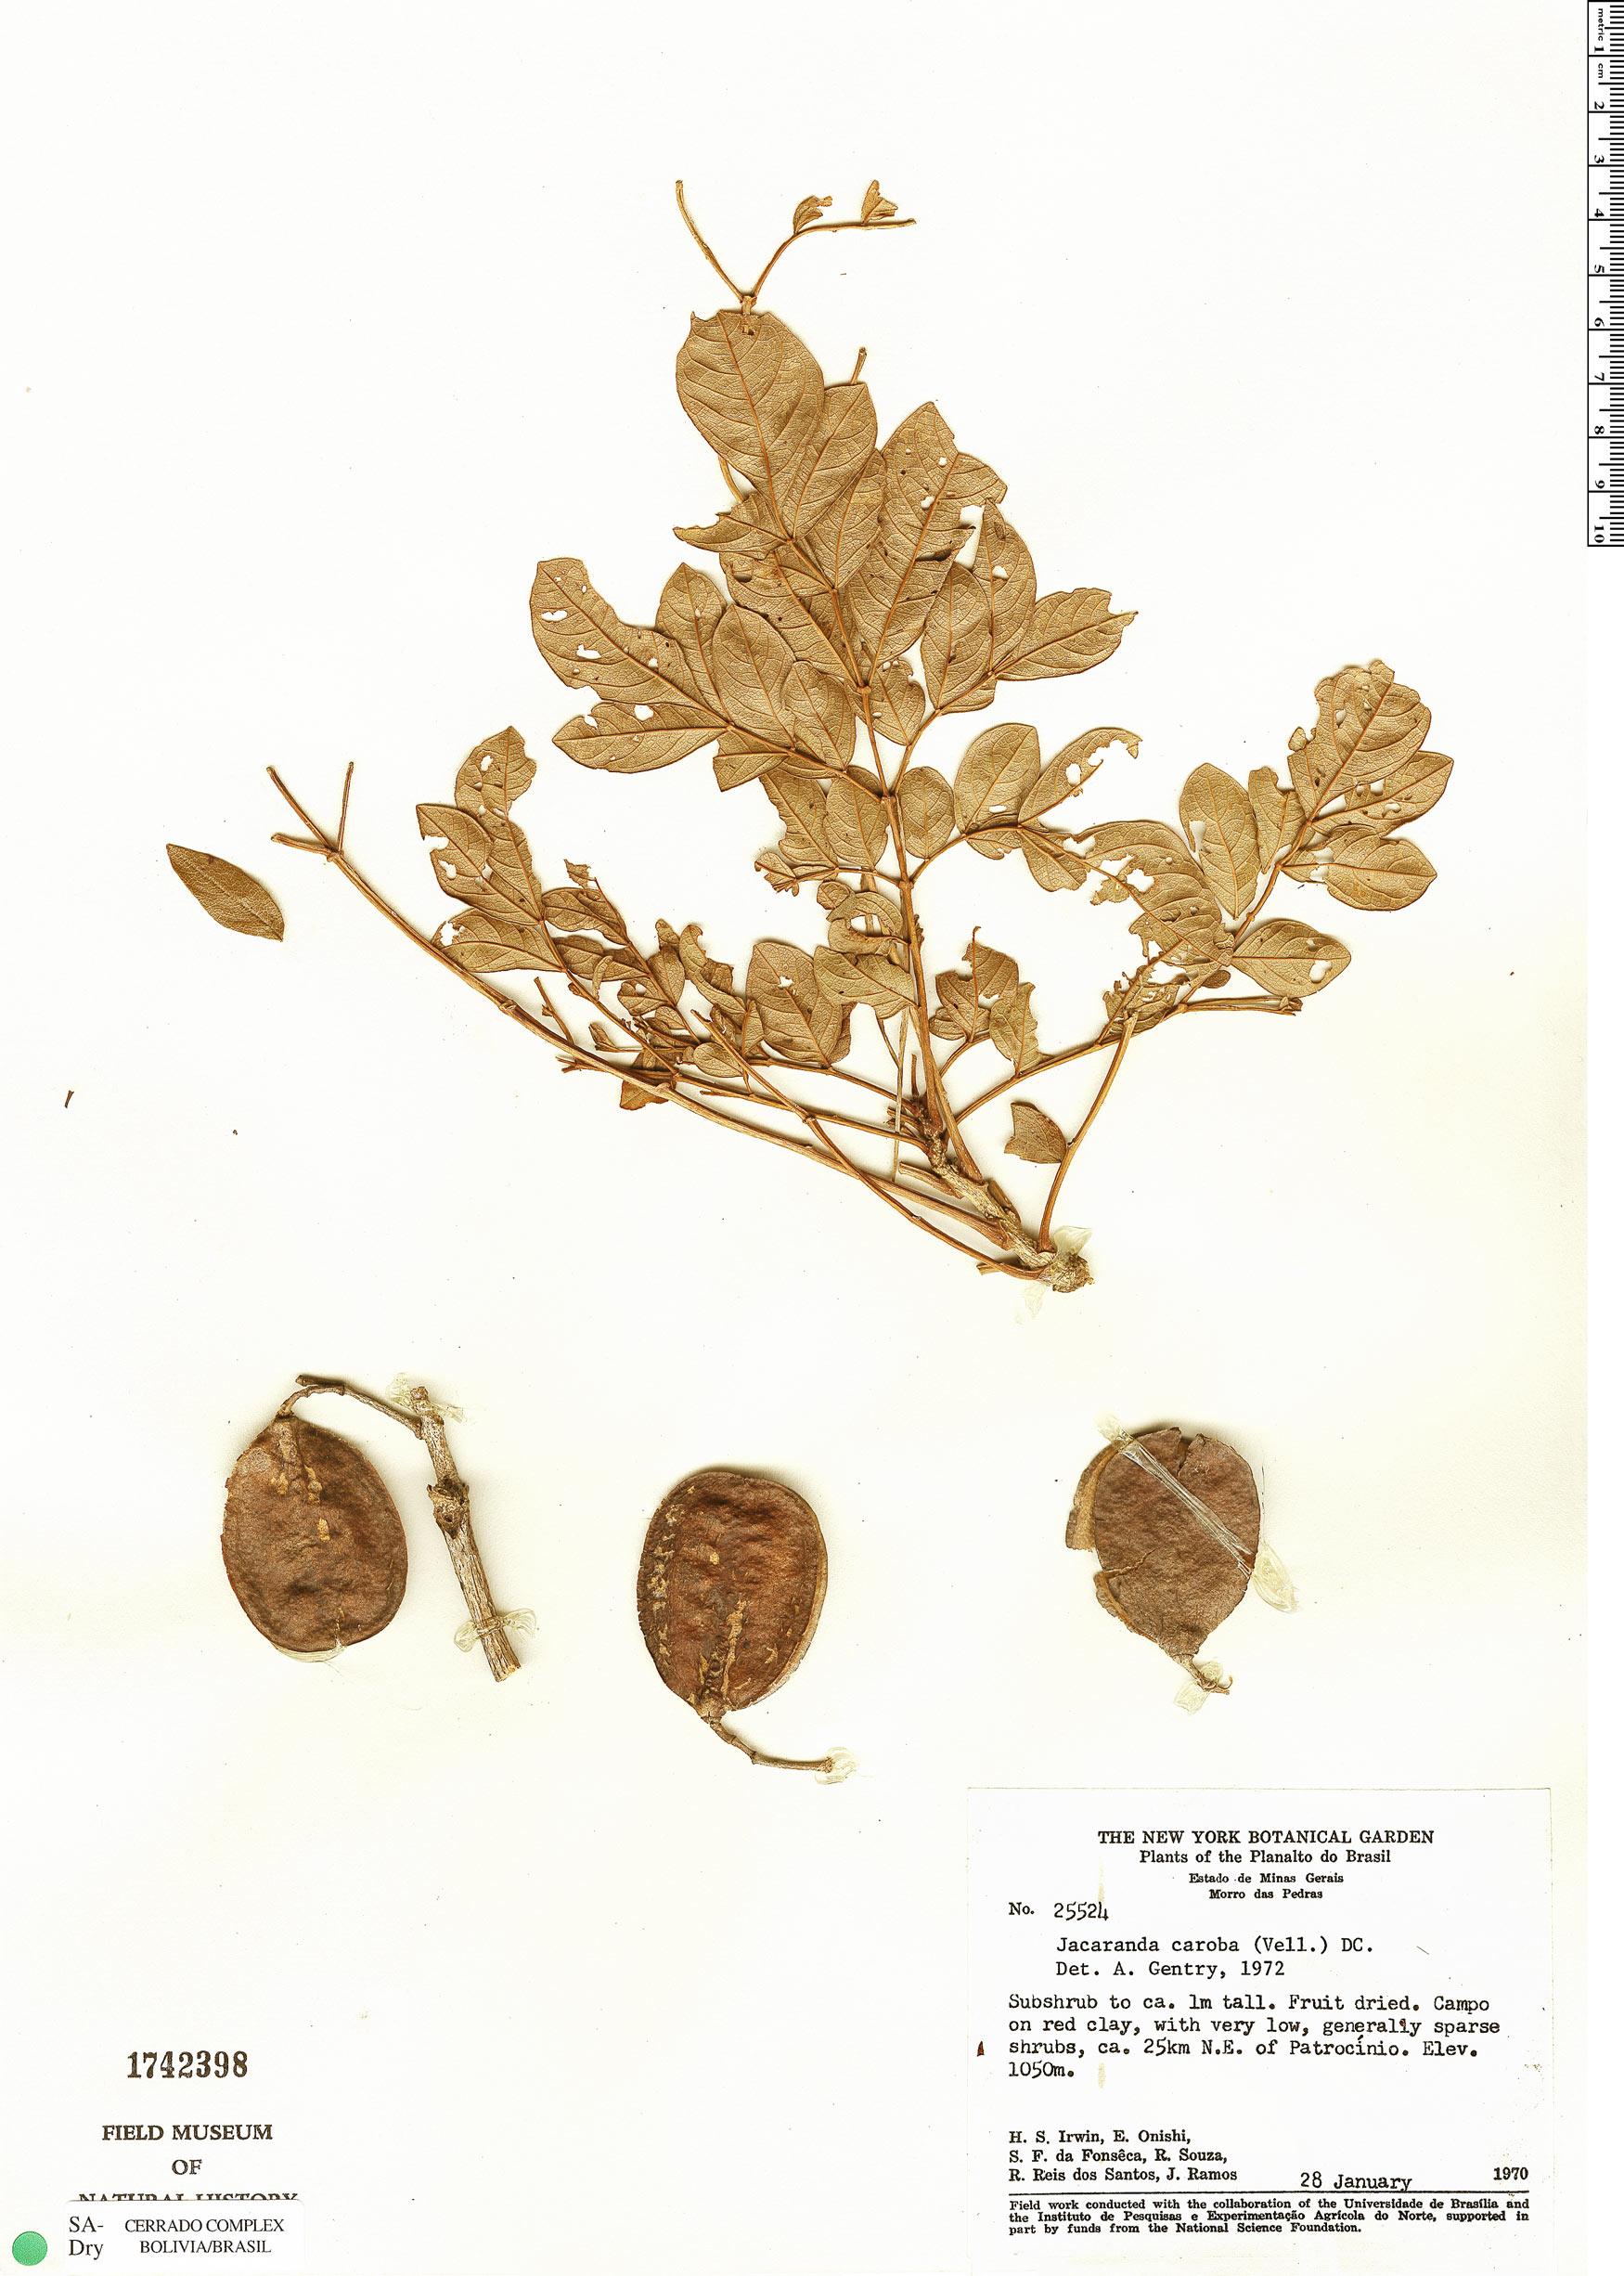 Specimen: Jacaranda caroba